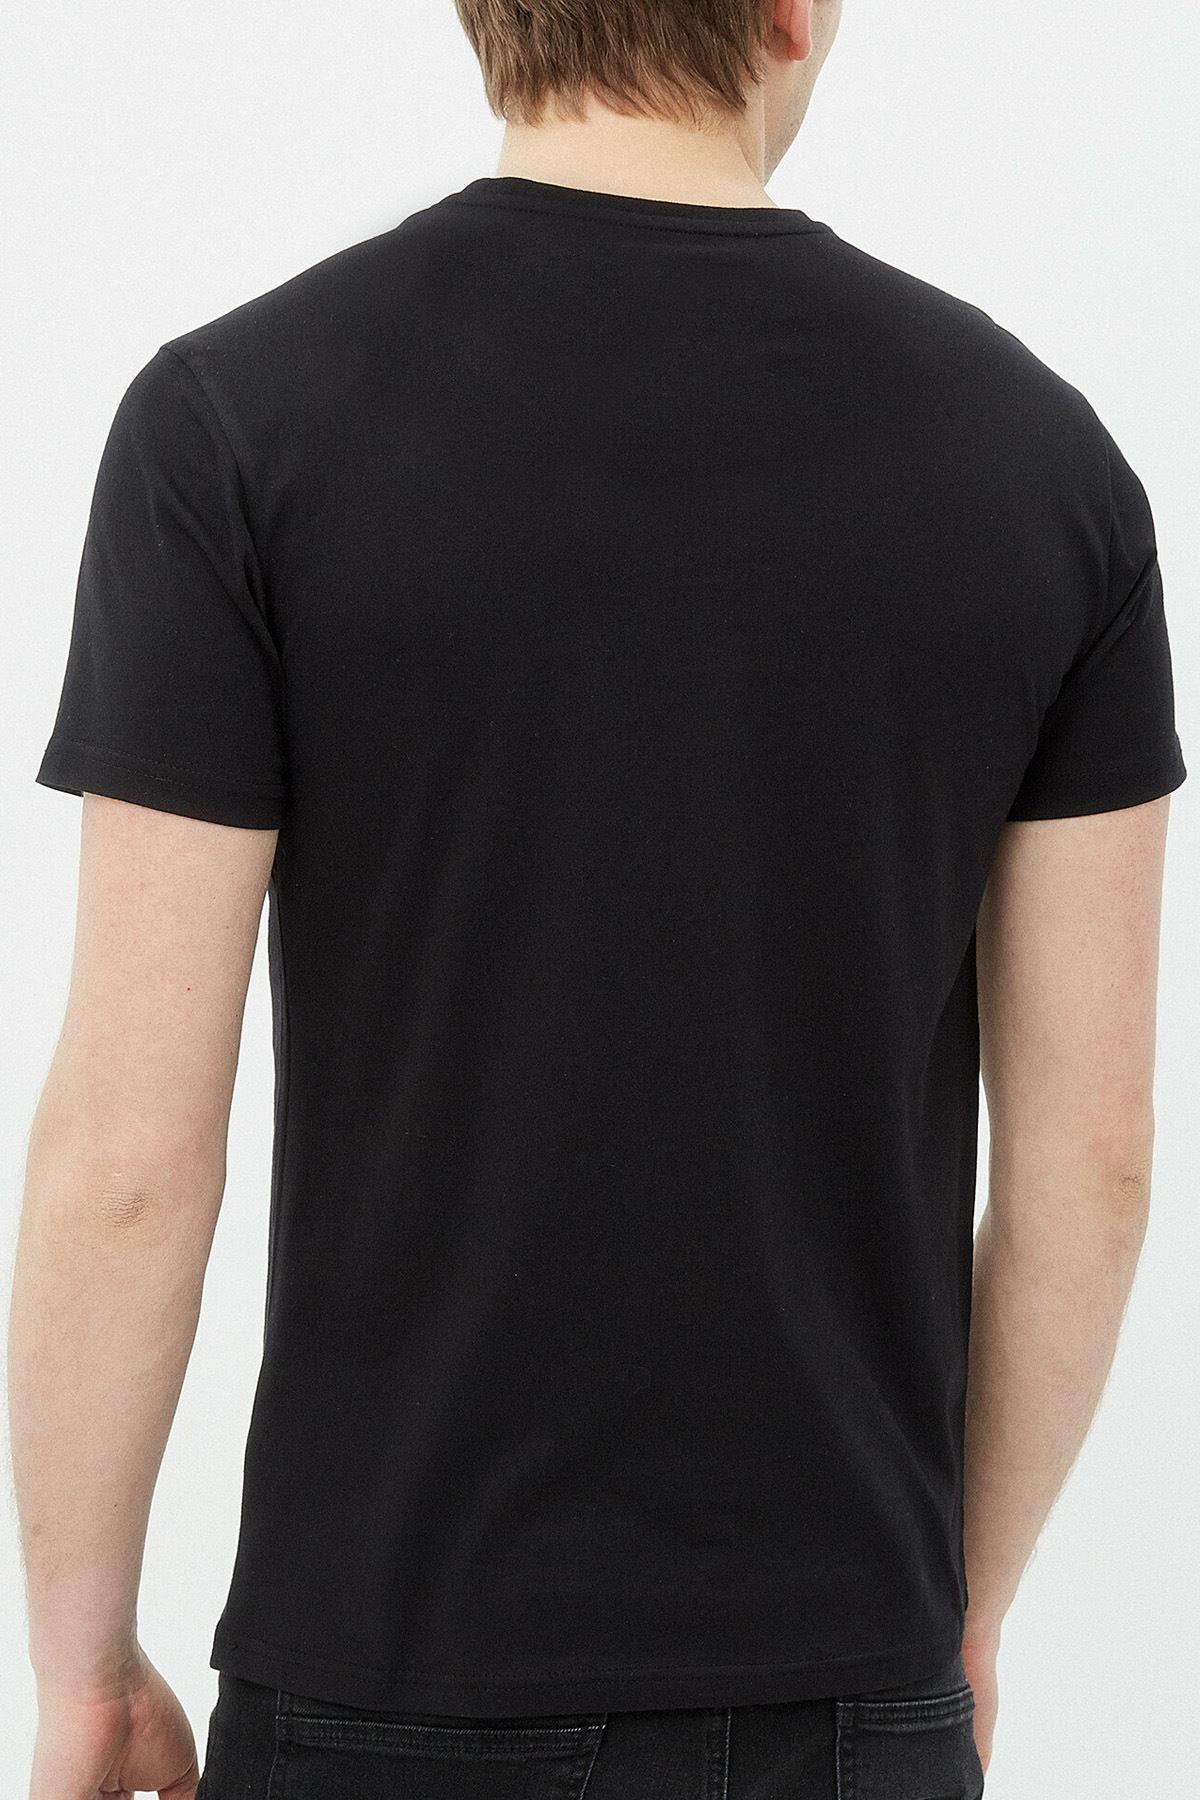 Anime Ryukkira 02 Siyah Erkek Tshirt - Tişört